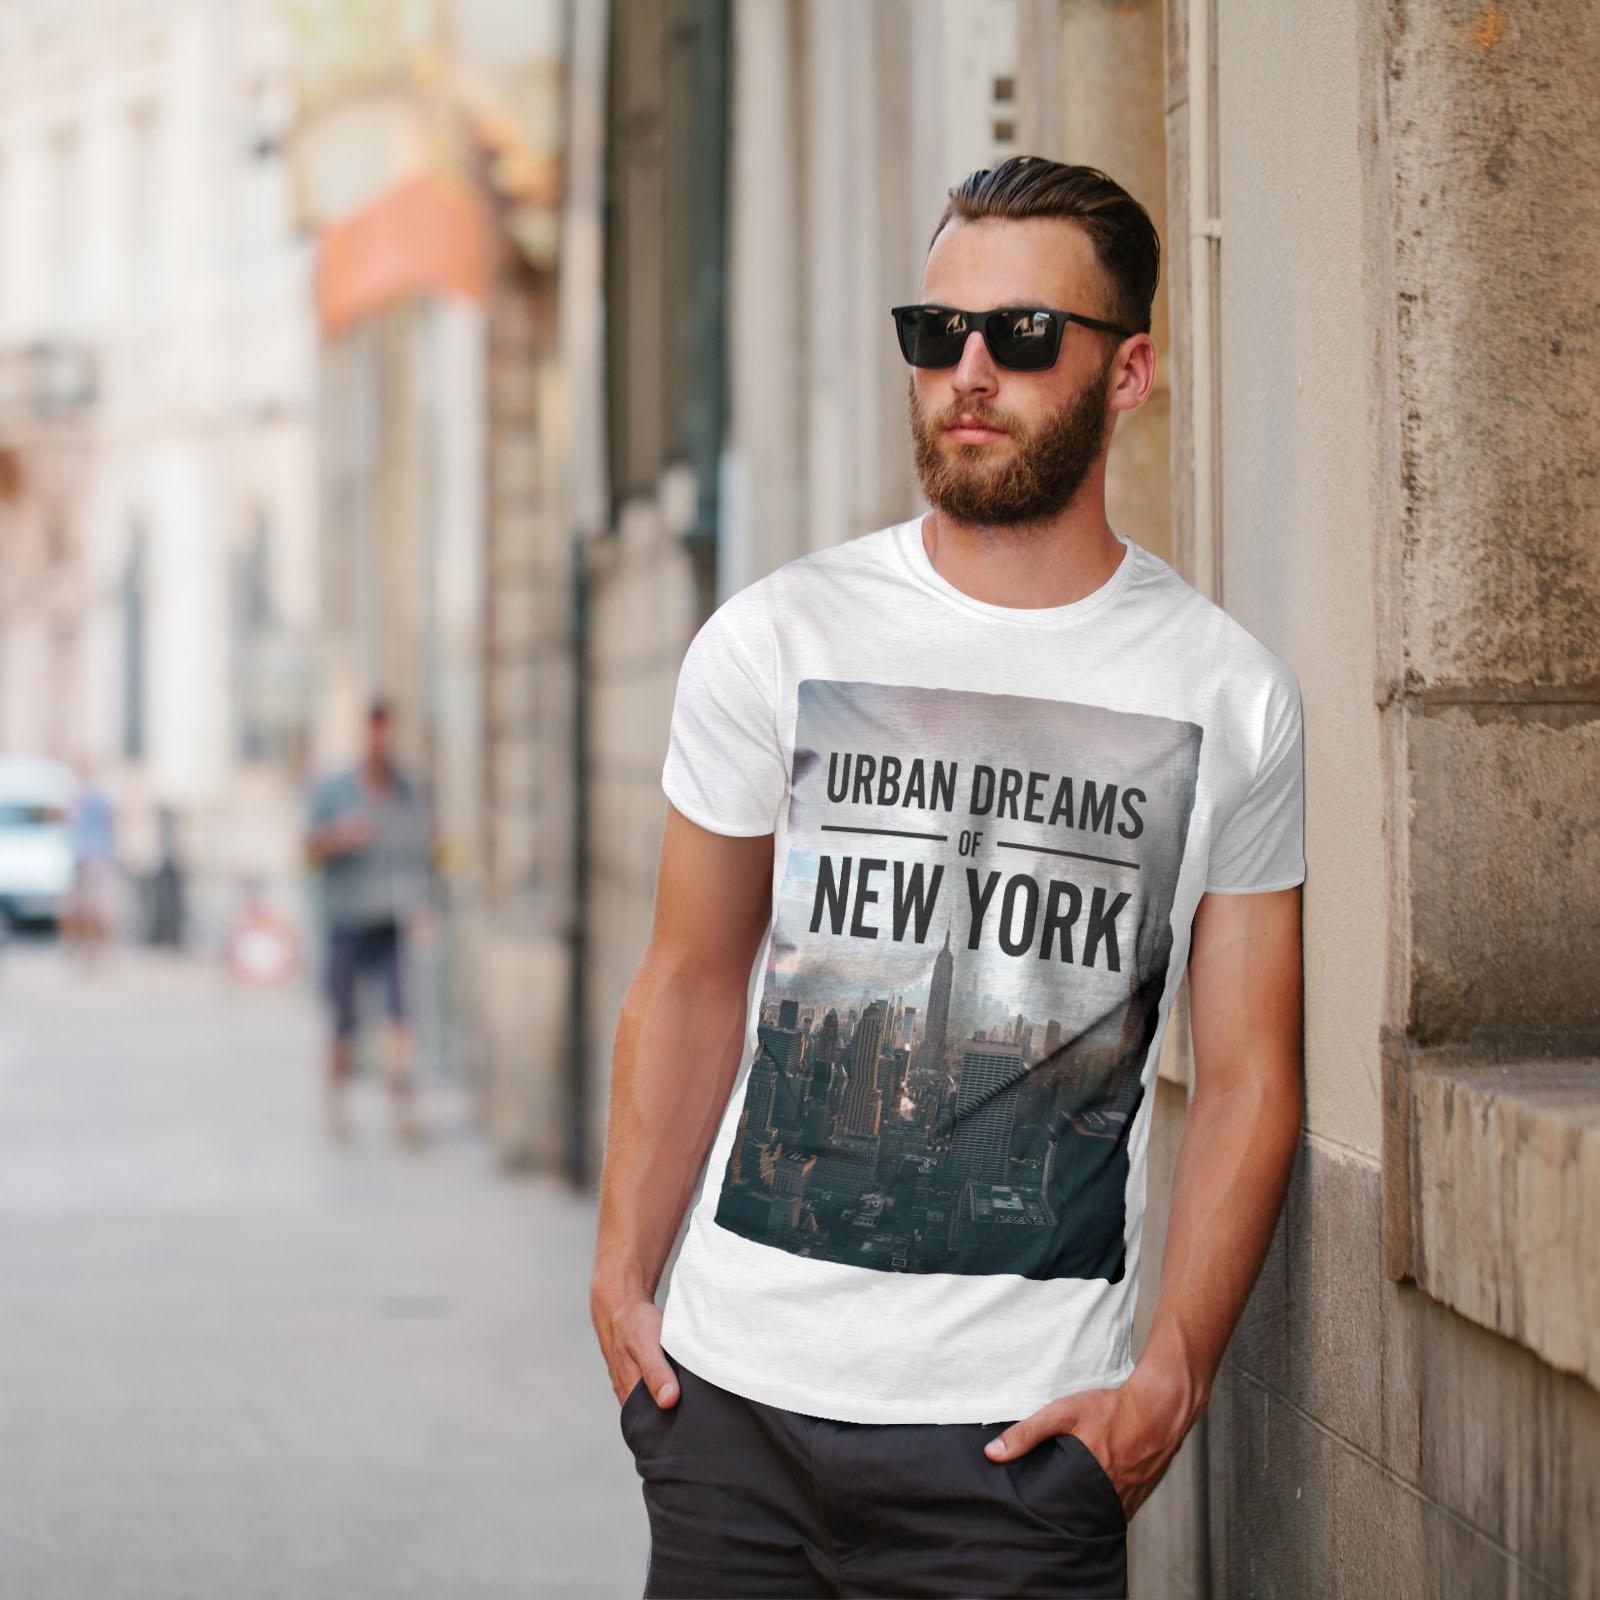 Urban Graphic Design Printed Tee Wellcoda Dream Urban Photo New Mens T-shirt